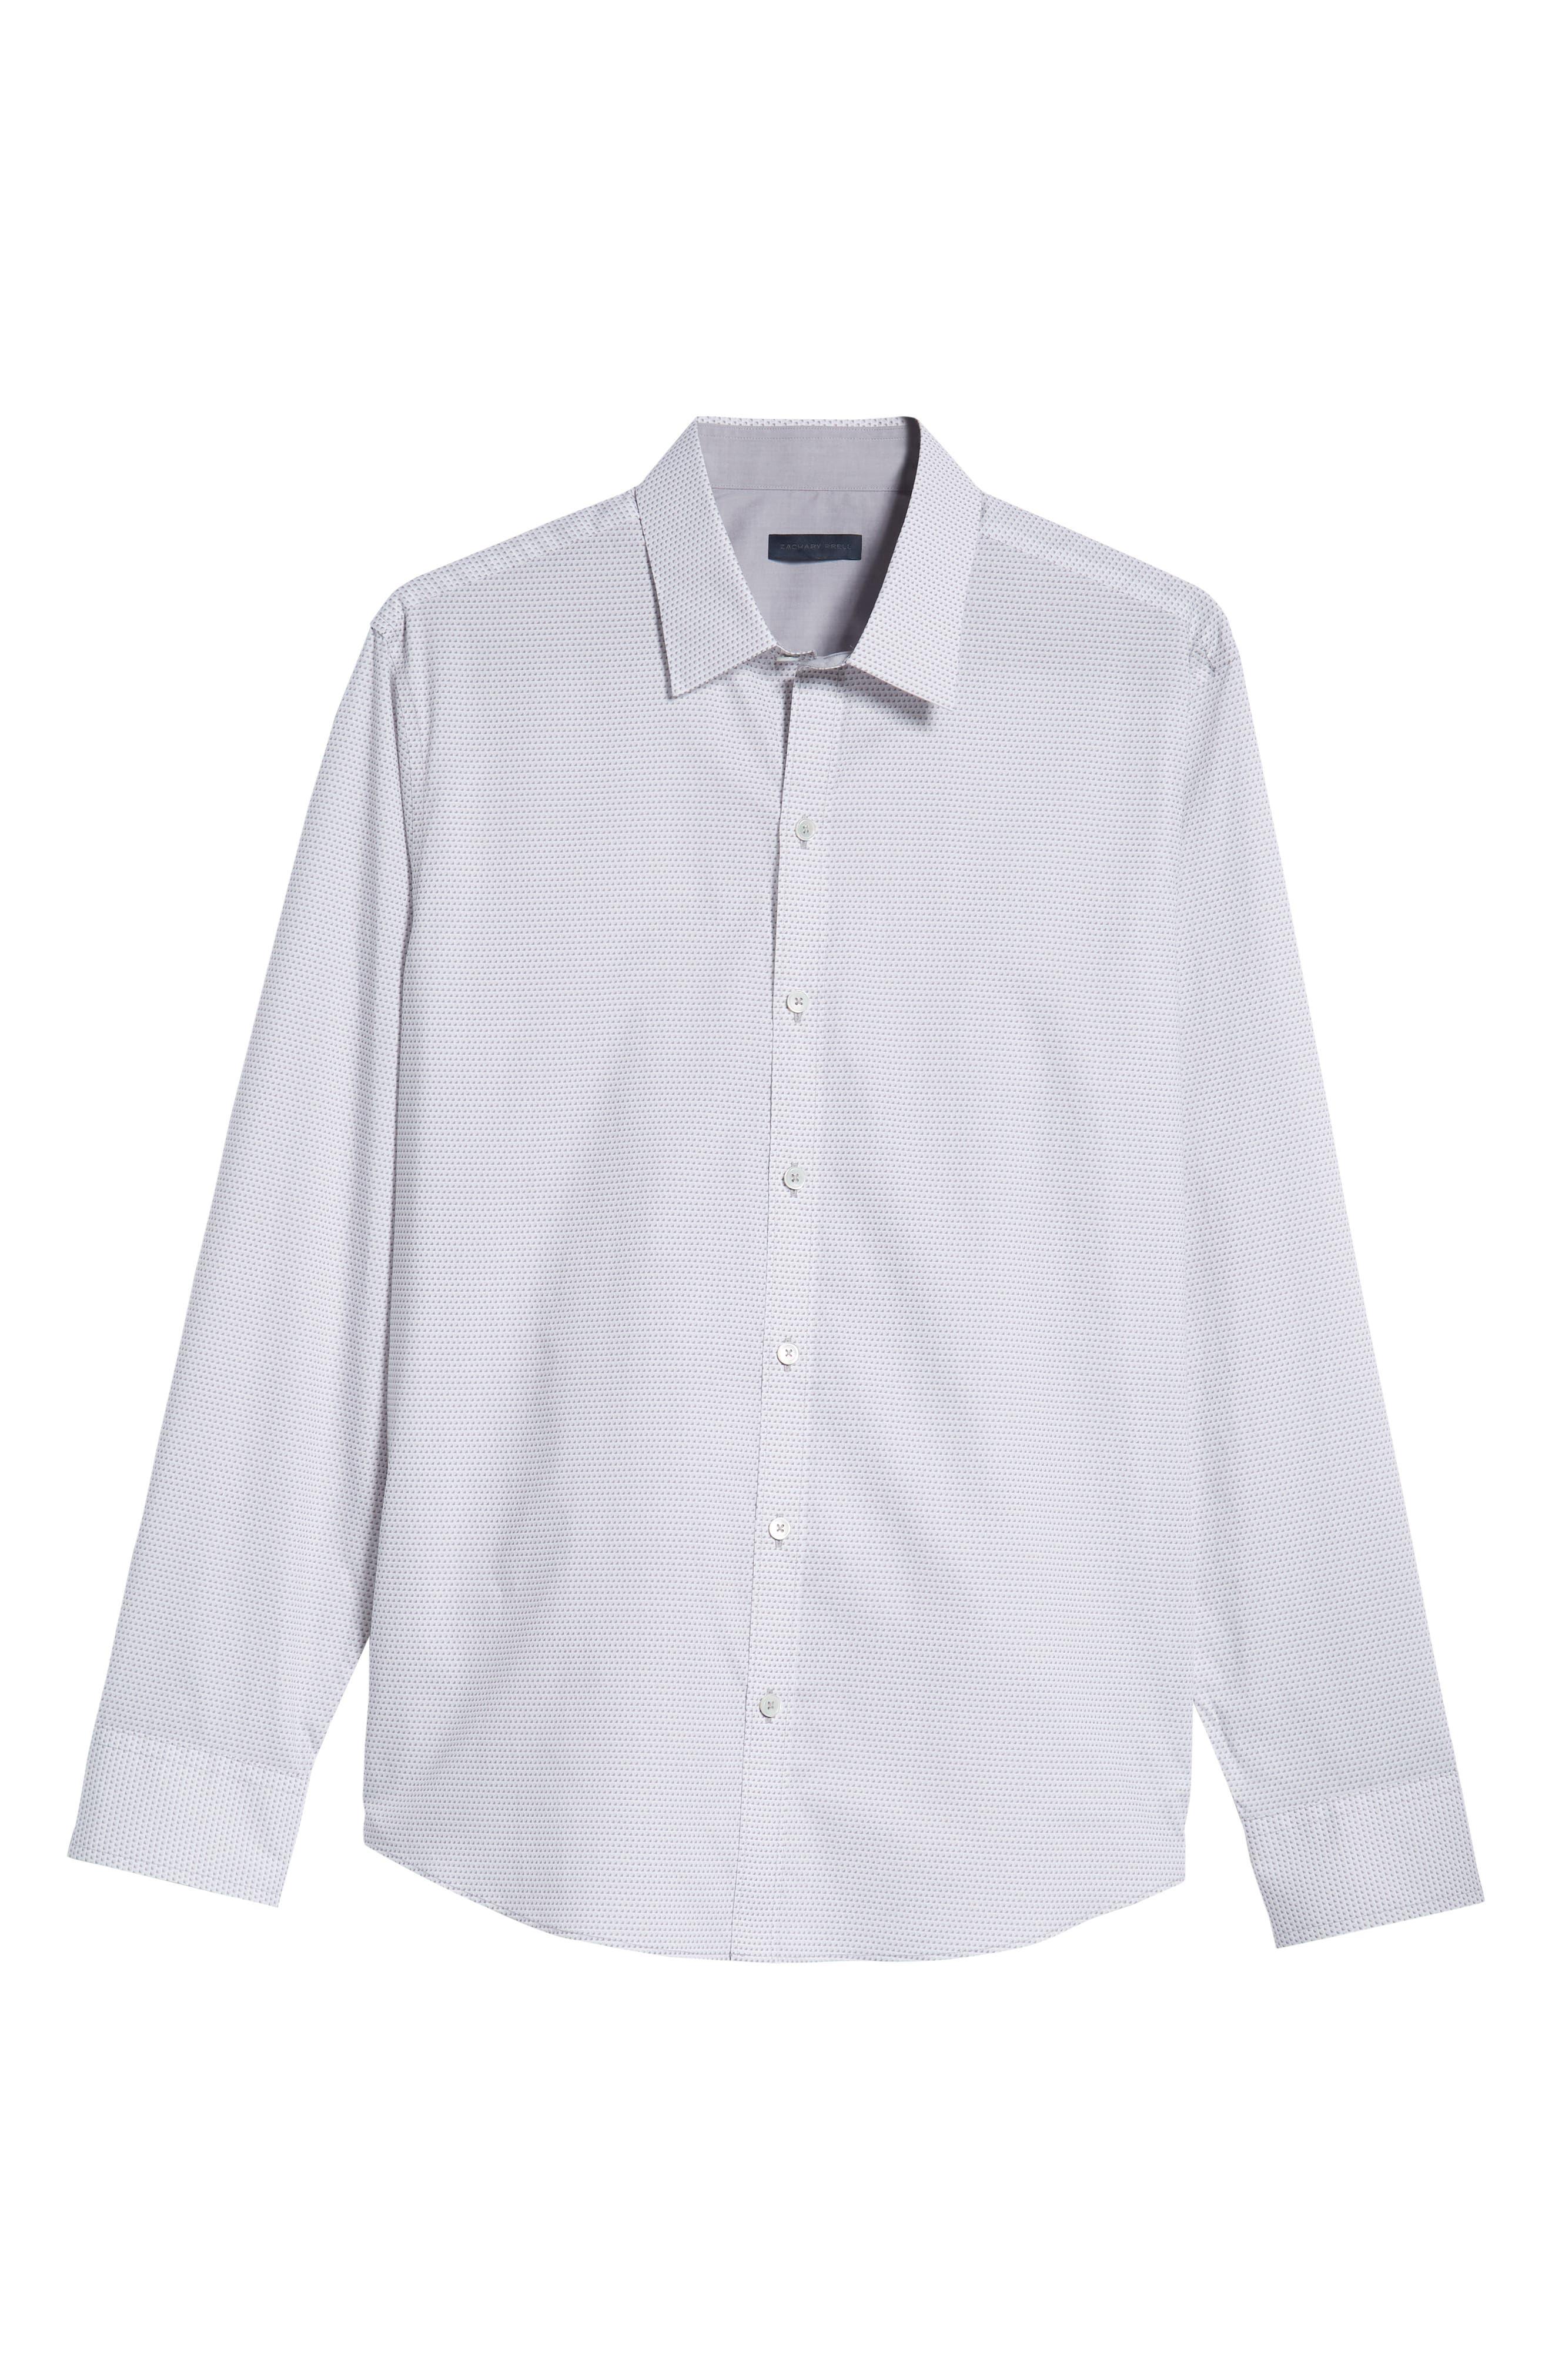 Toledo Regular Fit Microdot Sport Shirt,                             Alternate thumbnail 5, color,                             WHITE